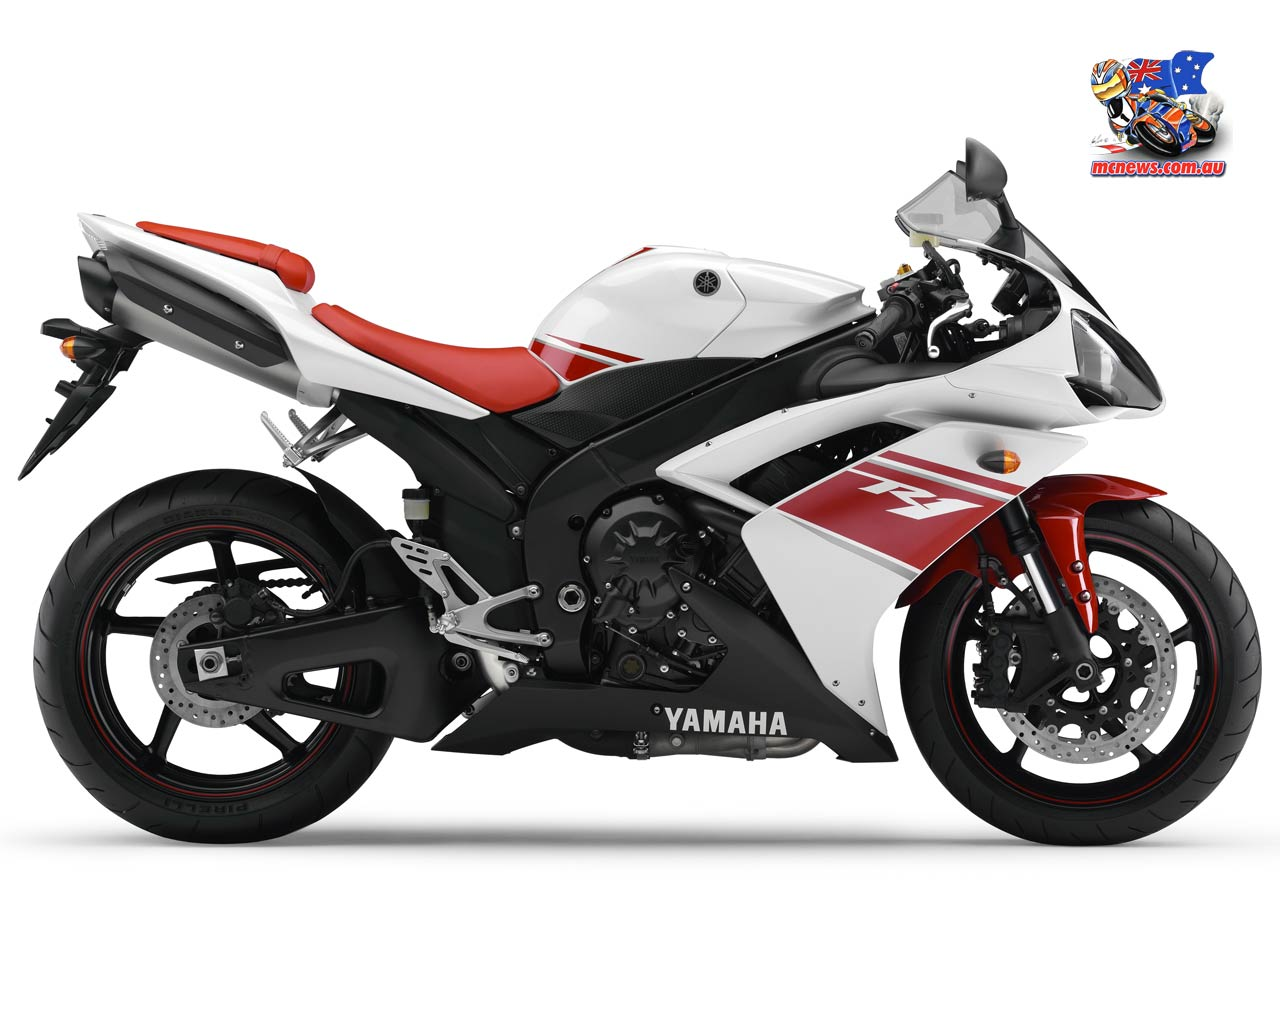 Yamaha R1 Wallpaper 22406 Hd Wallpapers in Bikes   Imagescicom 1280x1024